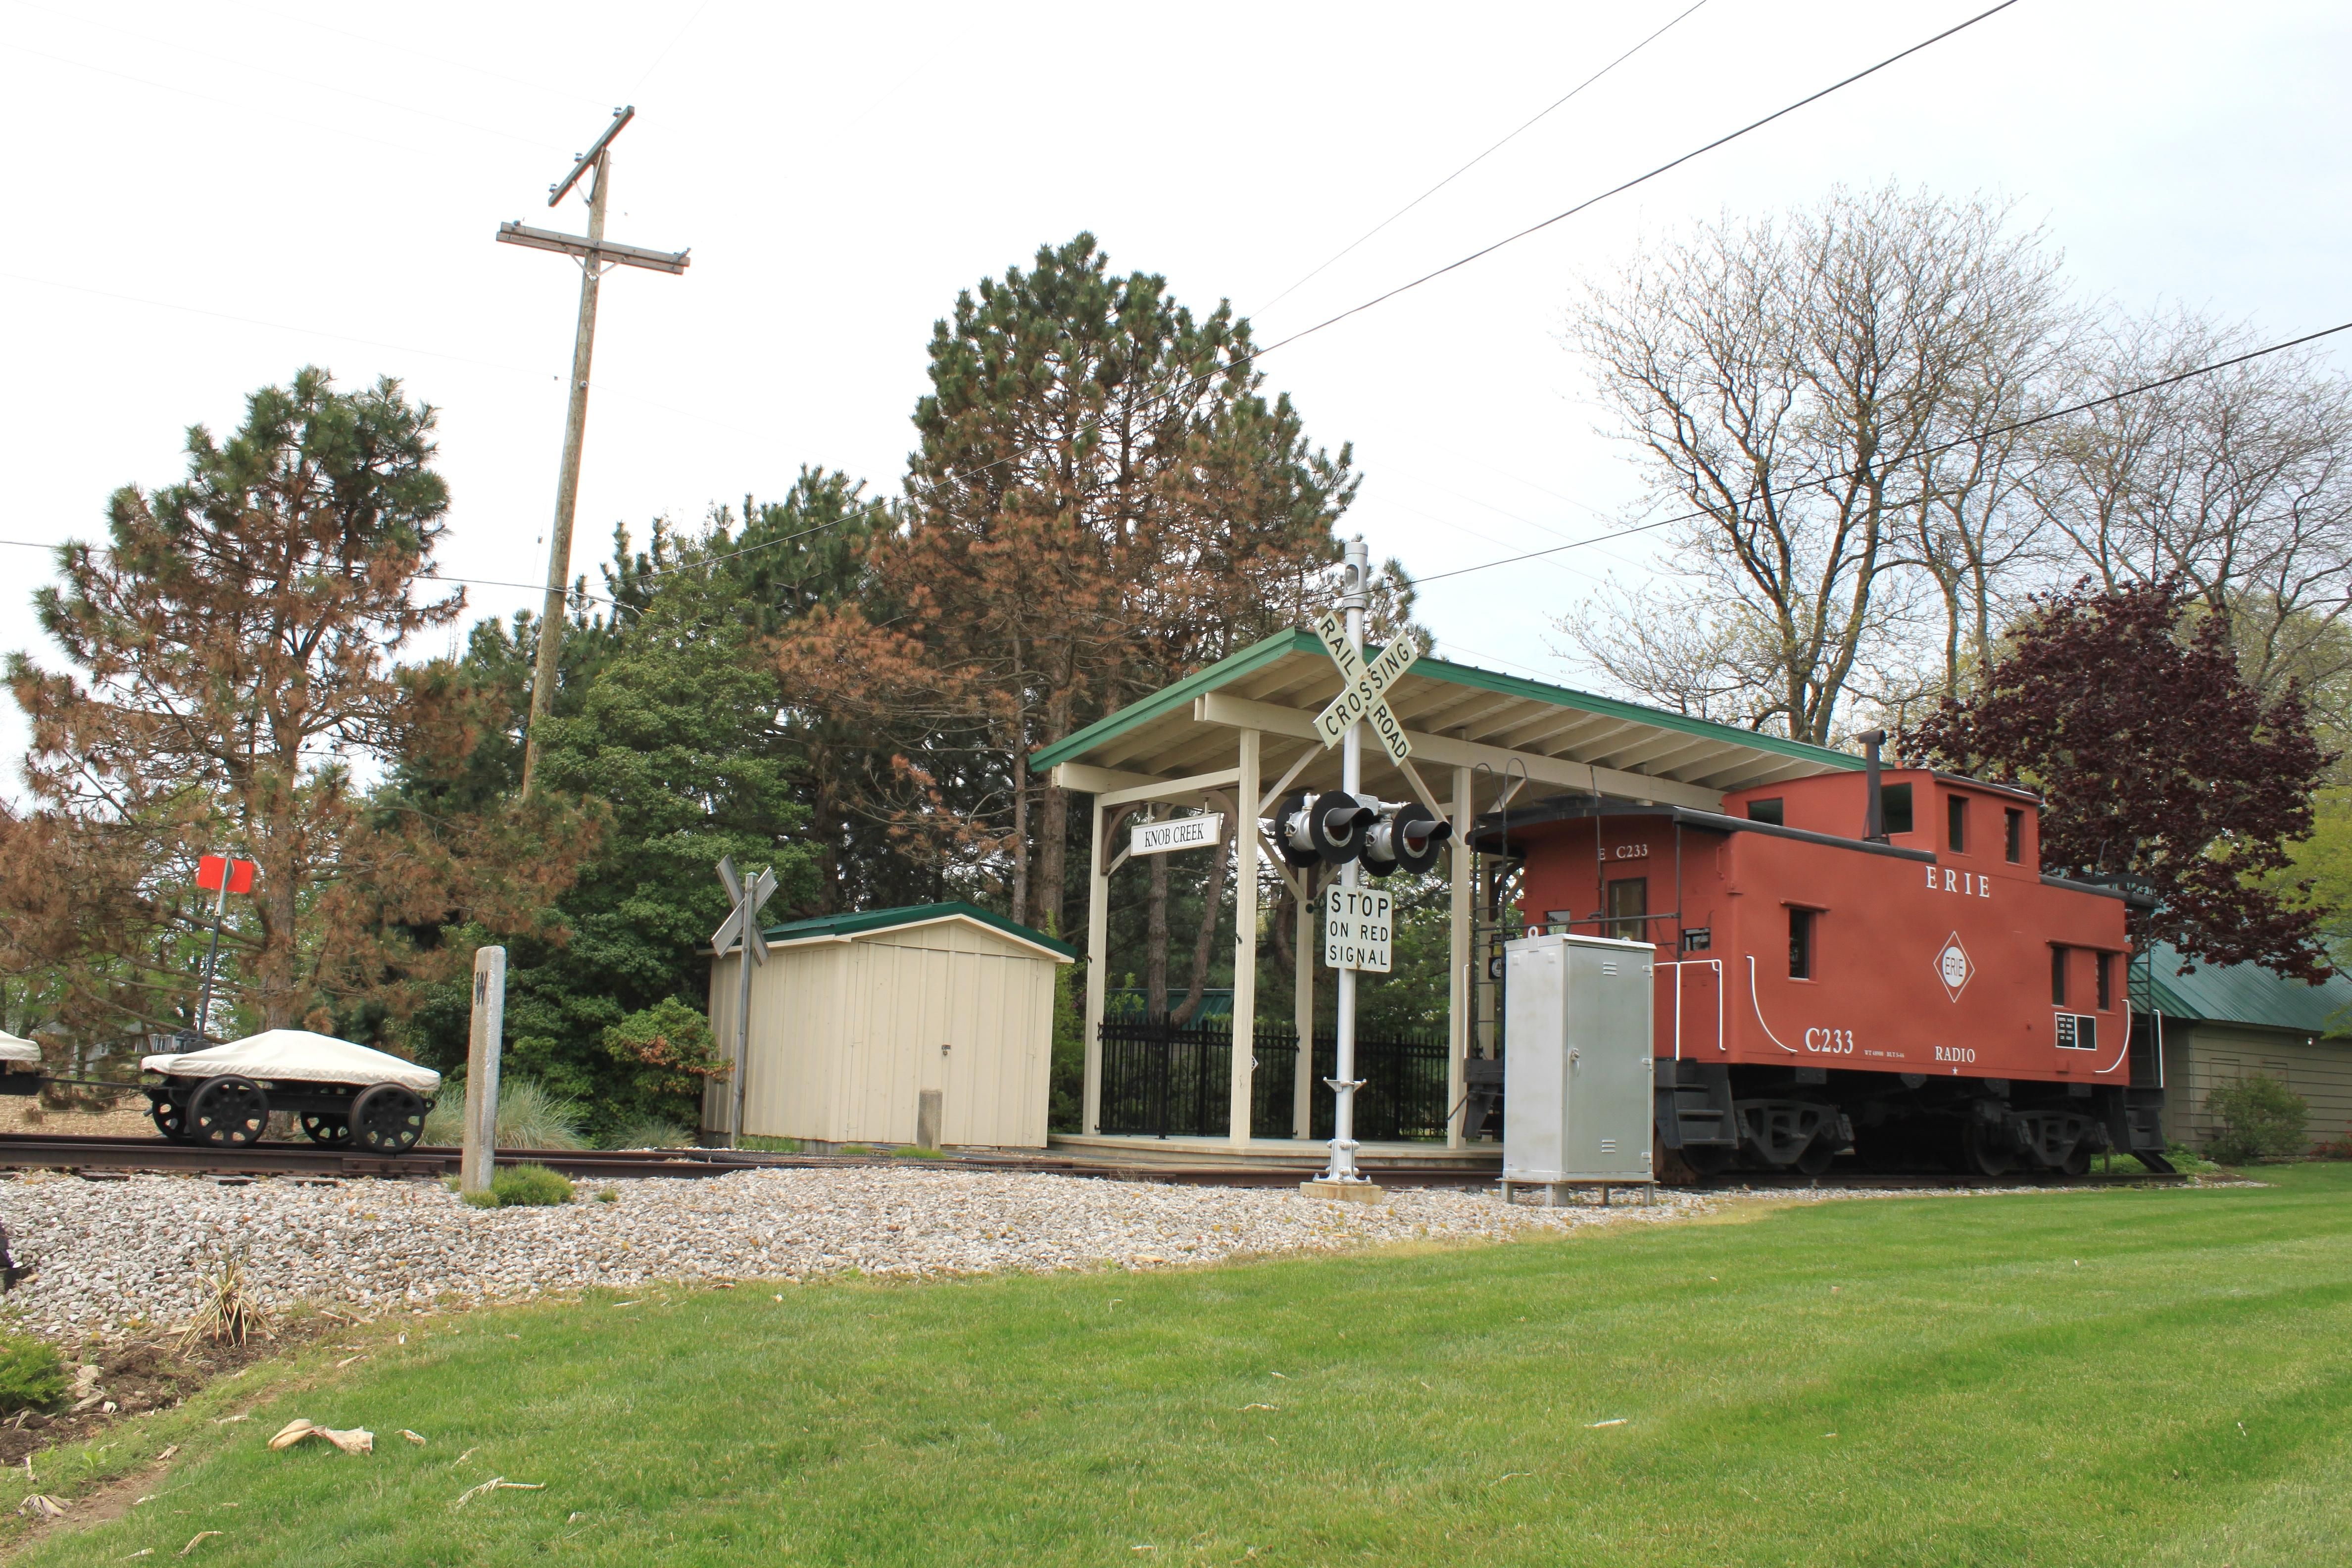 Backyard depot sheds 6x4